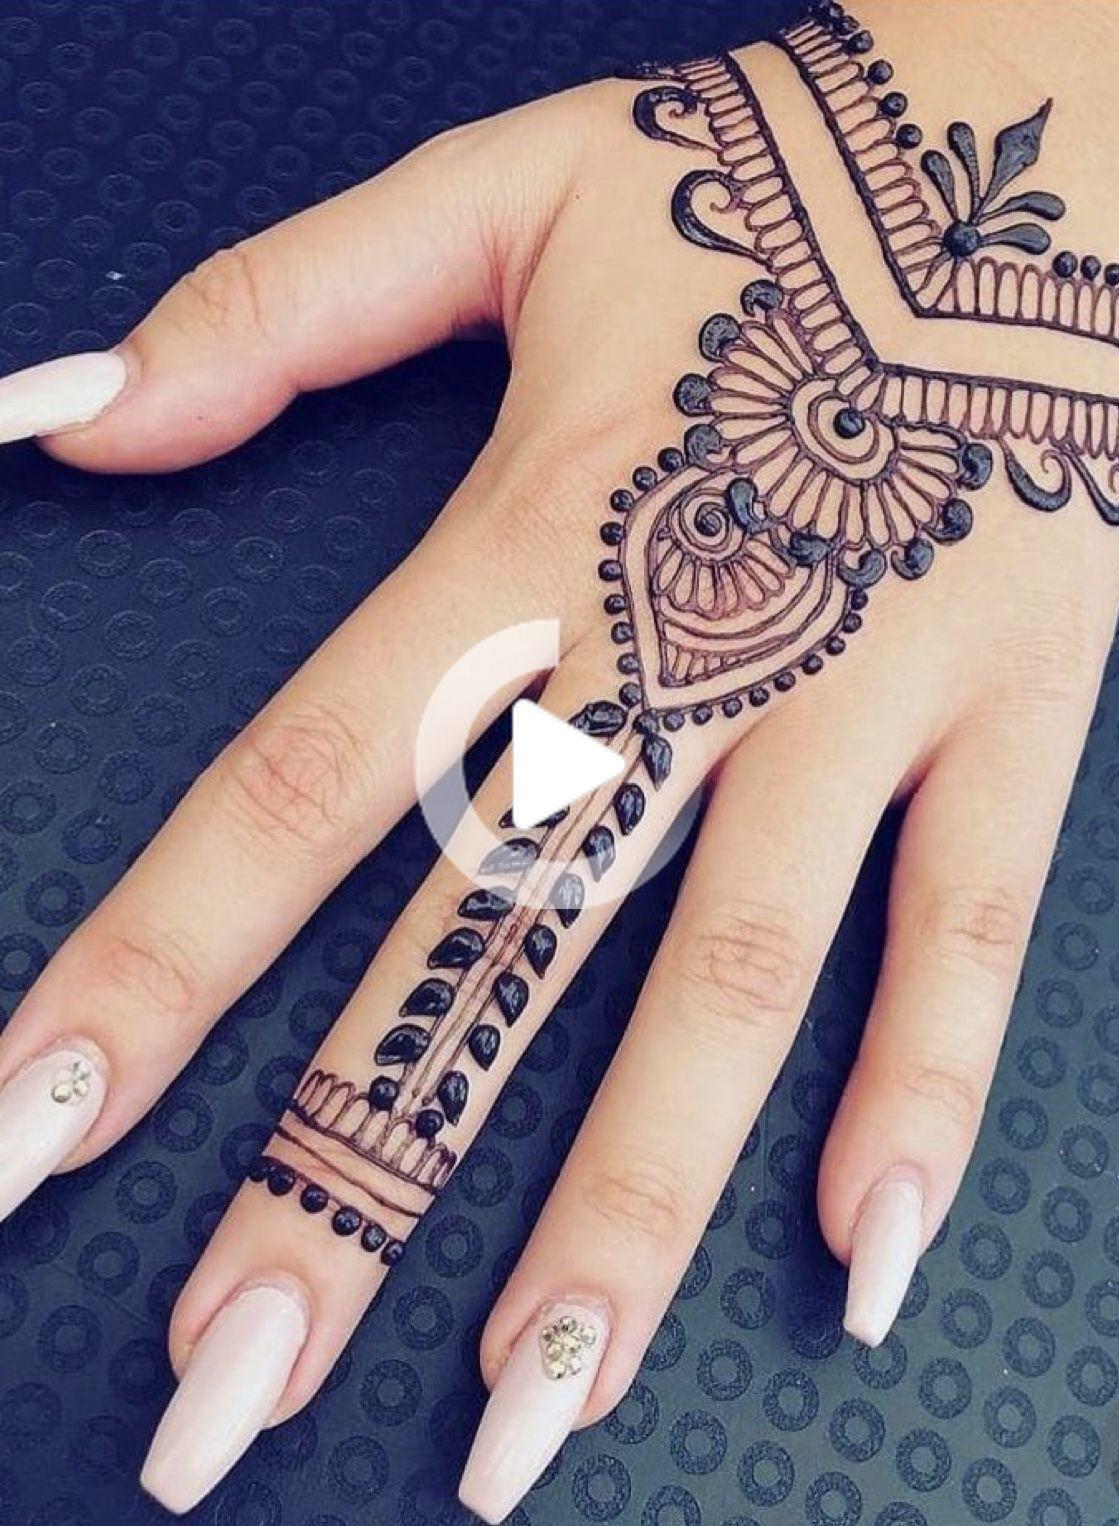 Hennatatoeages Tatoeageideeen In 2020 Henna Designs Feet Henna Tattoo Designs Simple Beginner Henna Designs